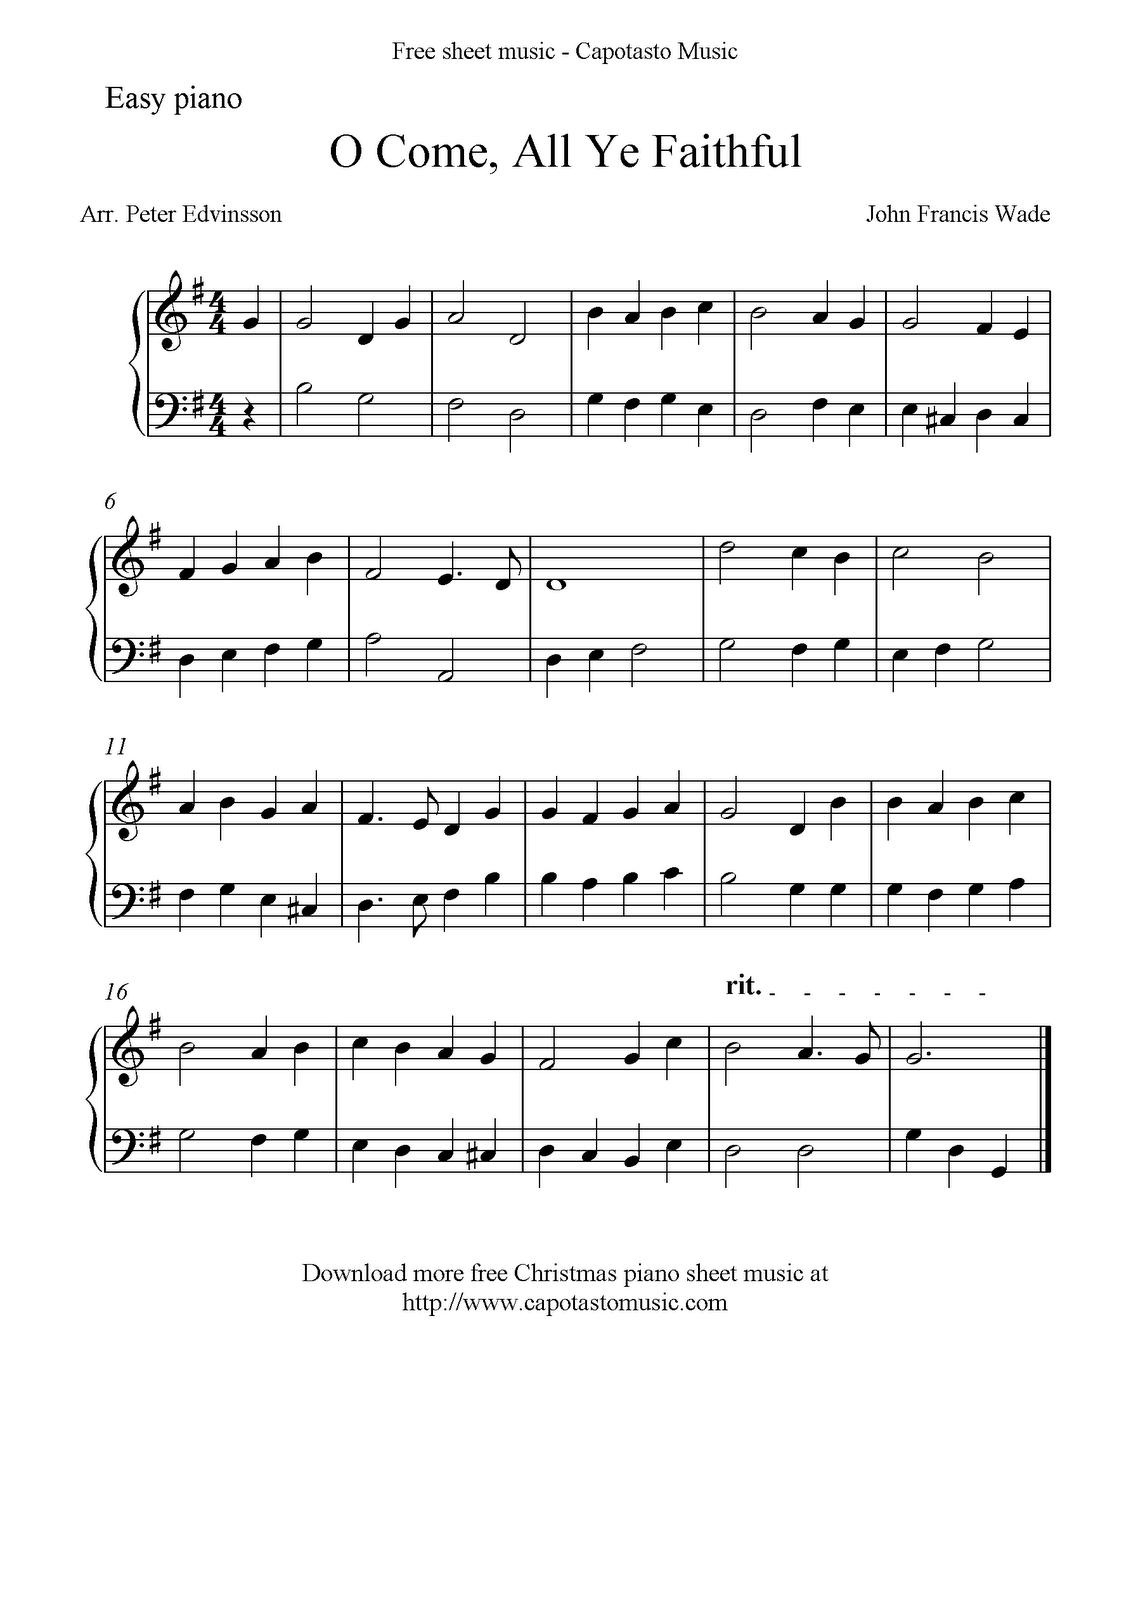 Free Printable Sheet Music Free Easy Christmas Piano Sheet Music O Come All Ye Faithful